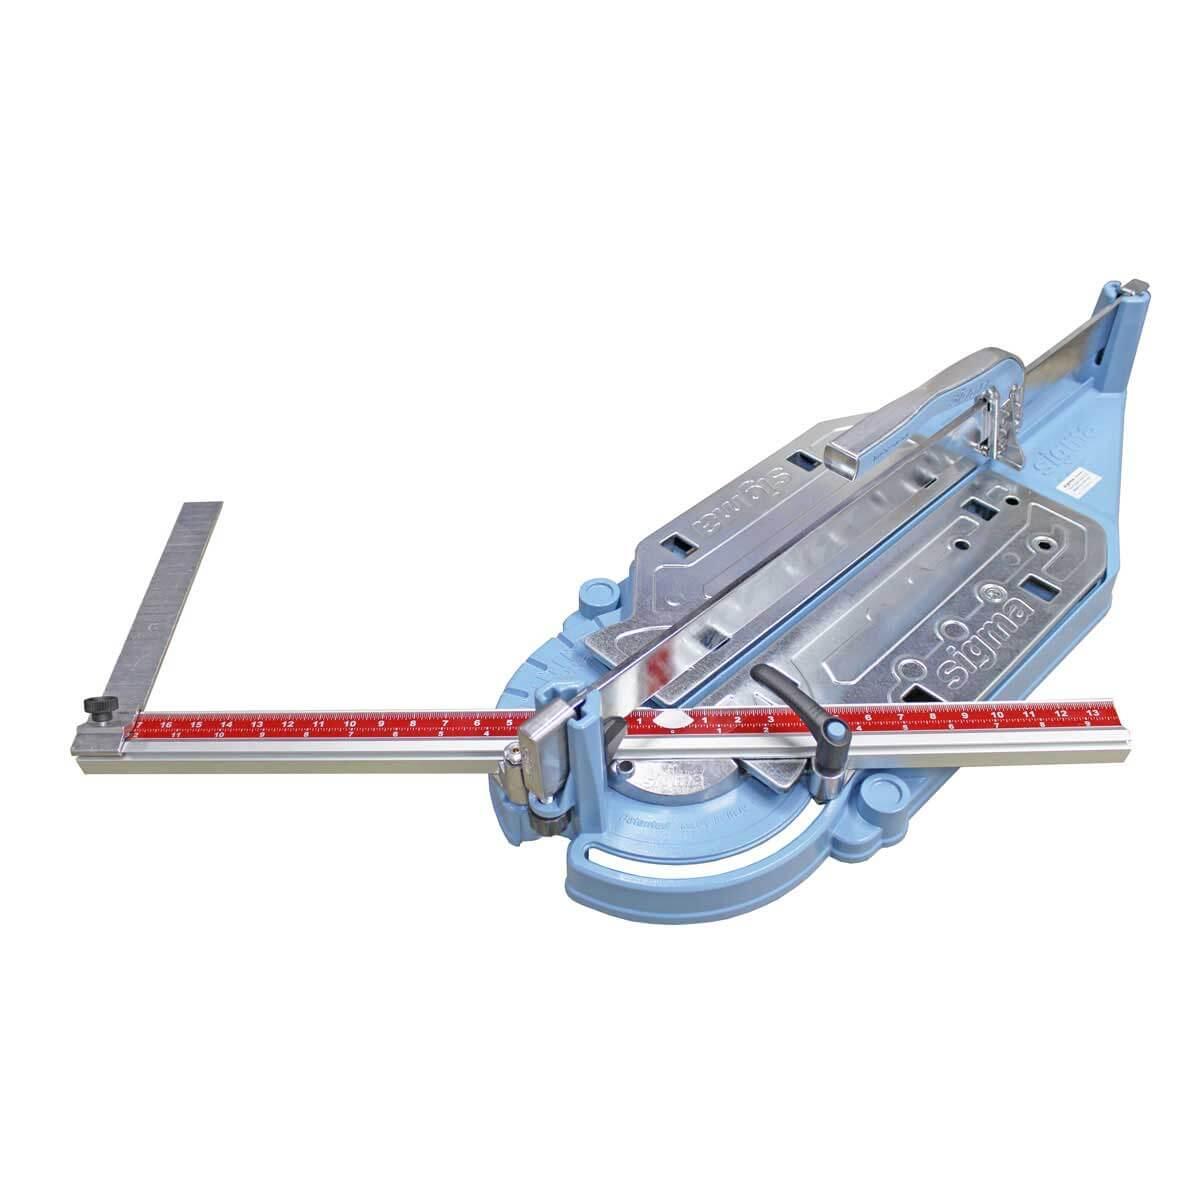 3BM 3BK 3B2 3B2M 3B2K Sigma Replacement Swivel Measurement Bar for model 3B 3B4 3B4M Tile Cutters